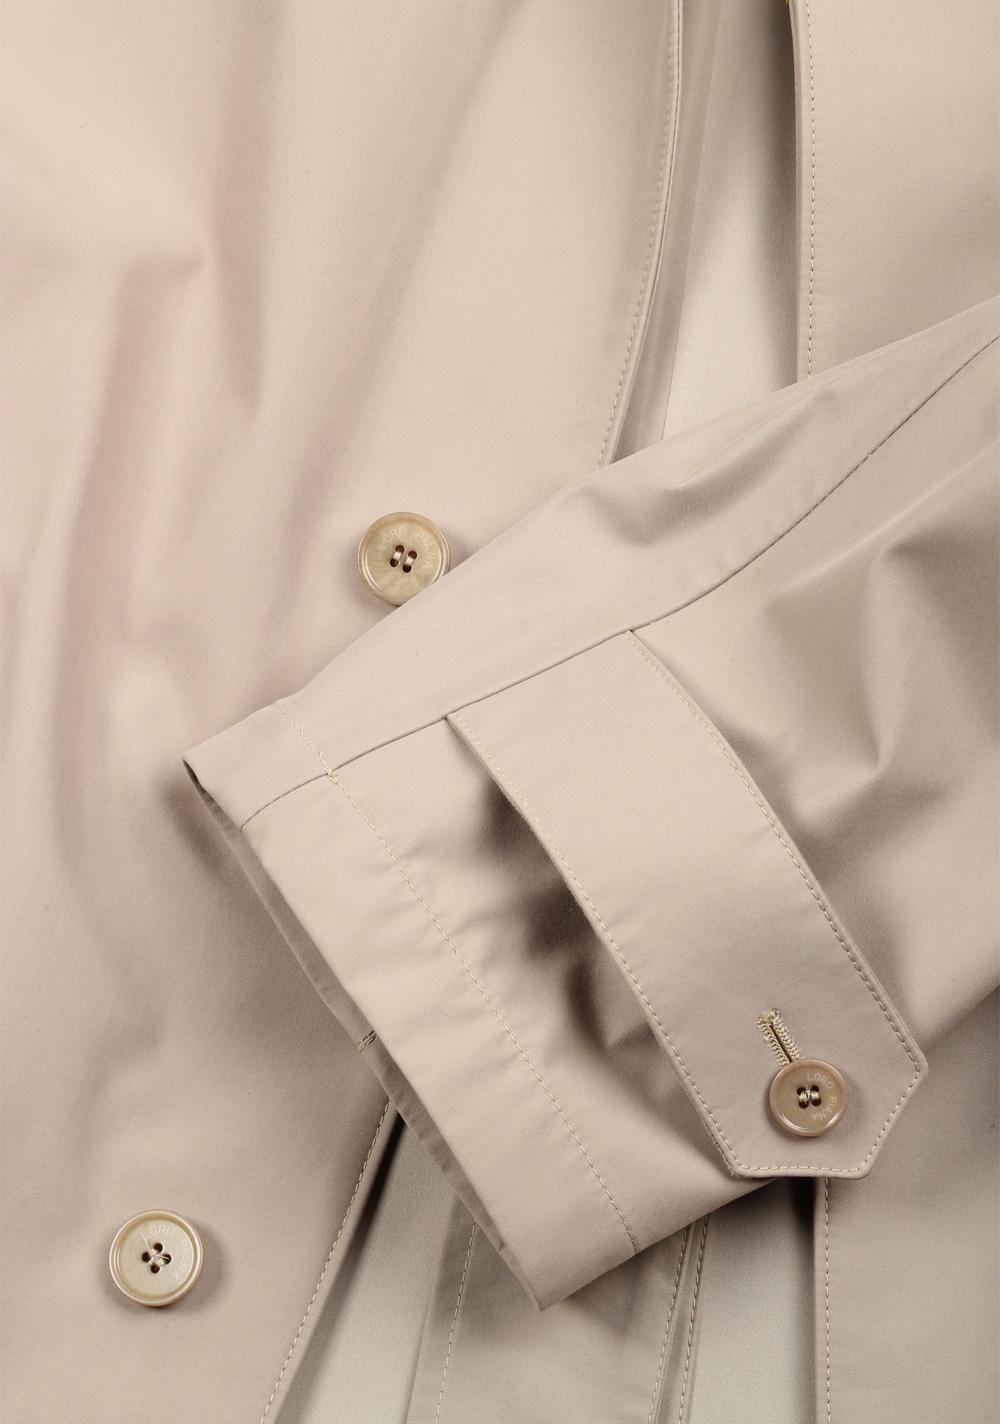 Loro Piana Blue Storm System City Trench Coat Size XXL / 46 U.S. Outerwear | Costume Limité